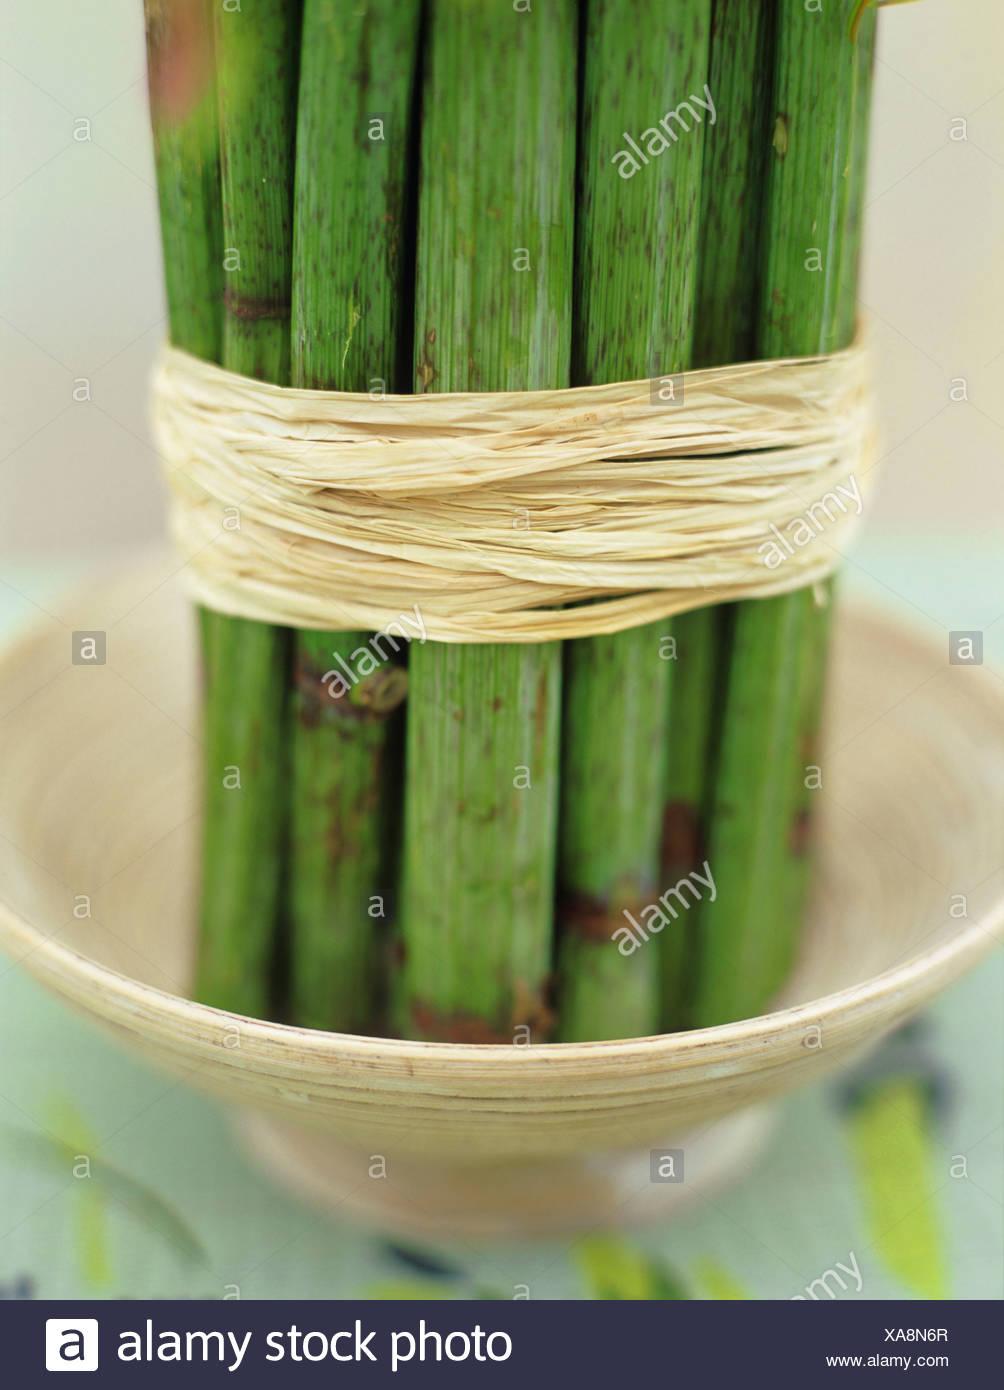 Bamboo (Rheinautria) stem tied up with bast, close-up - Stock Image